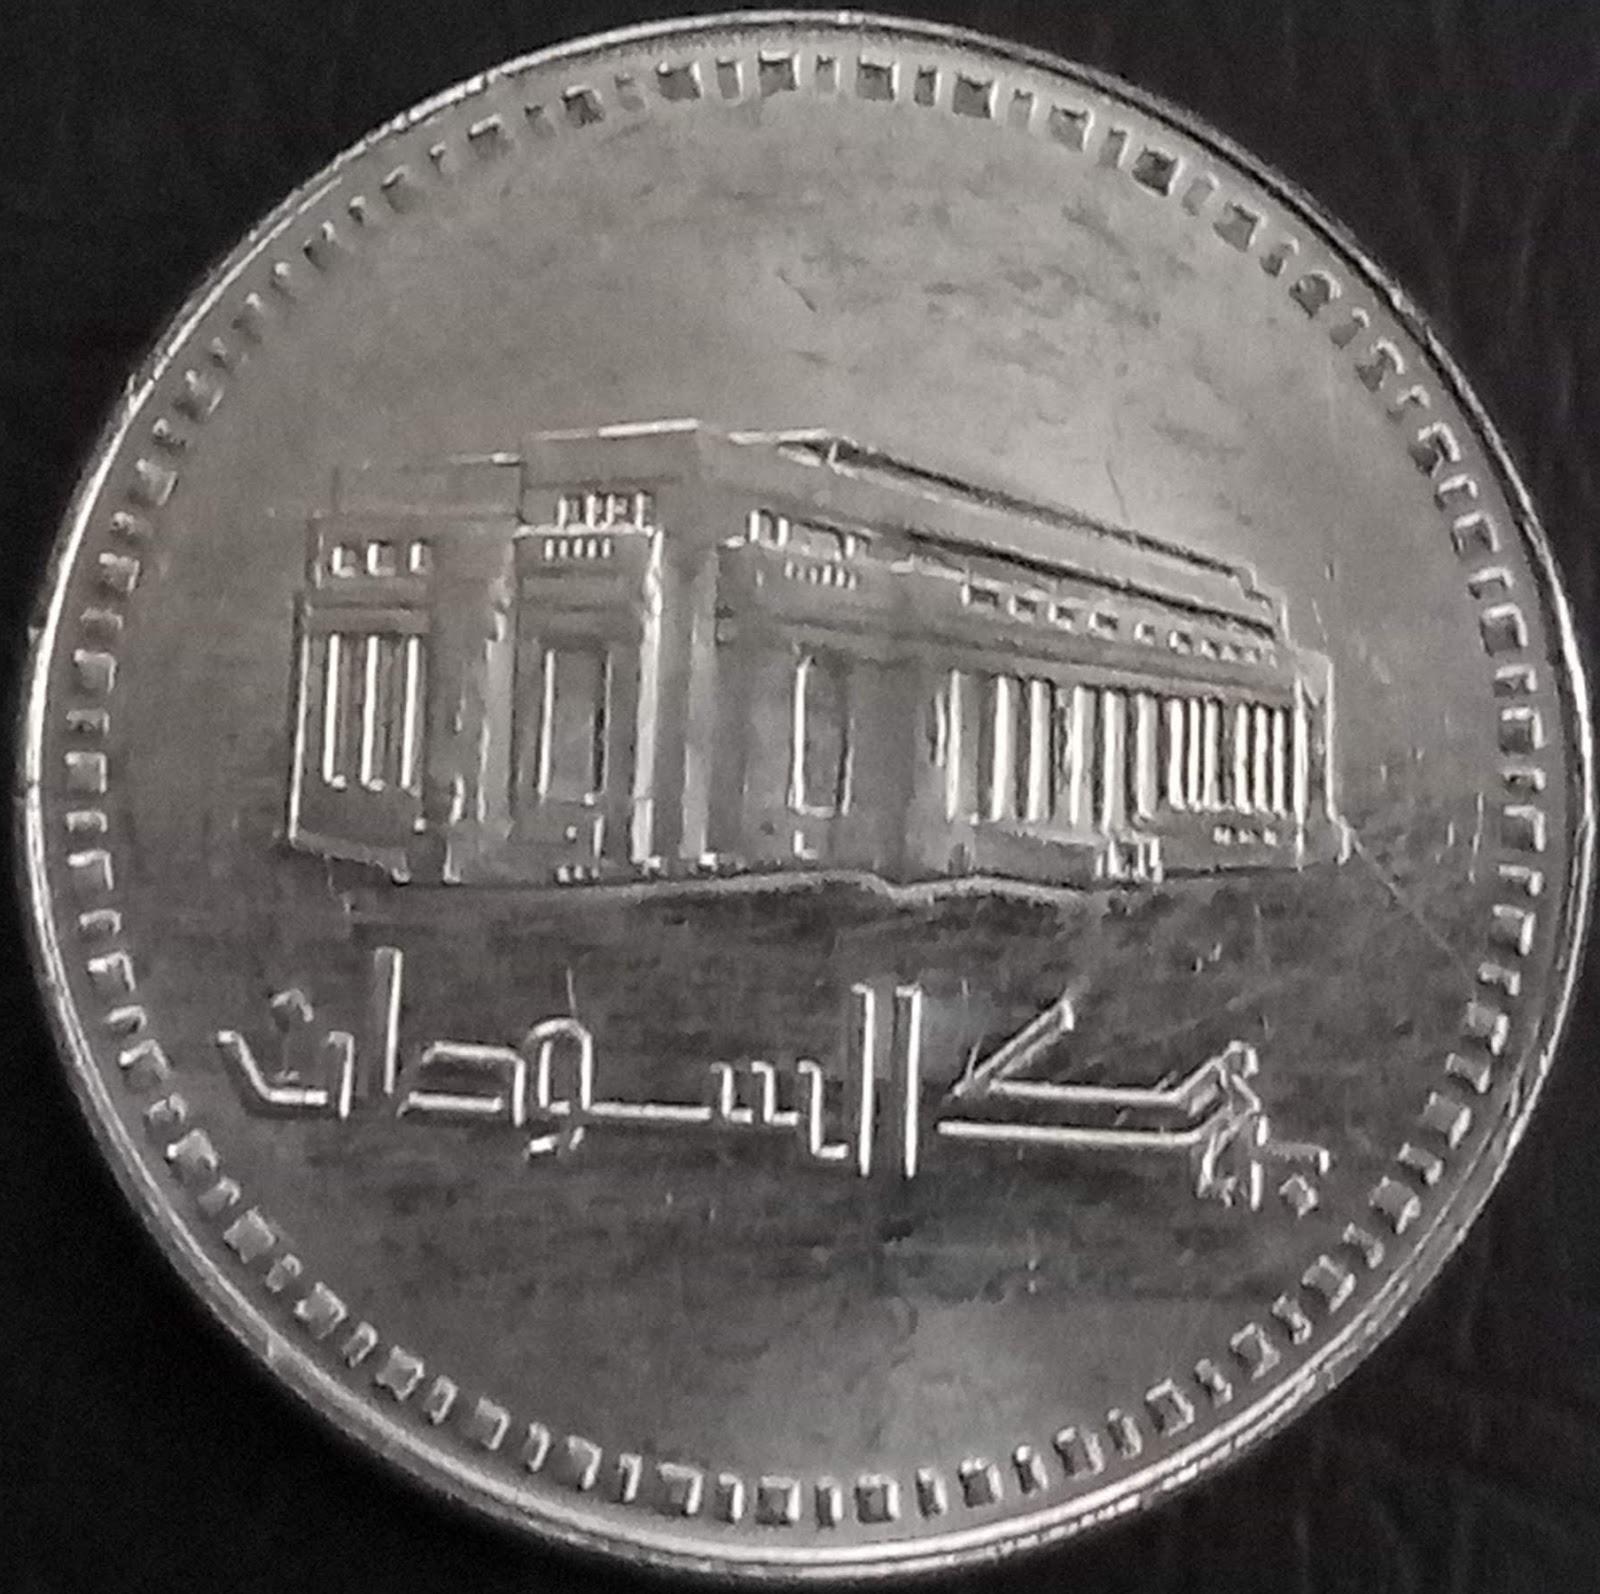 World Coin Shop Sudan First Pound 1956 1992 25 Qirsh